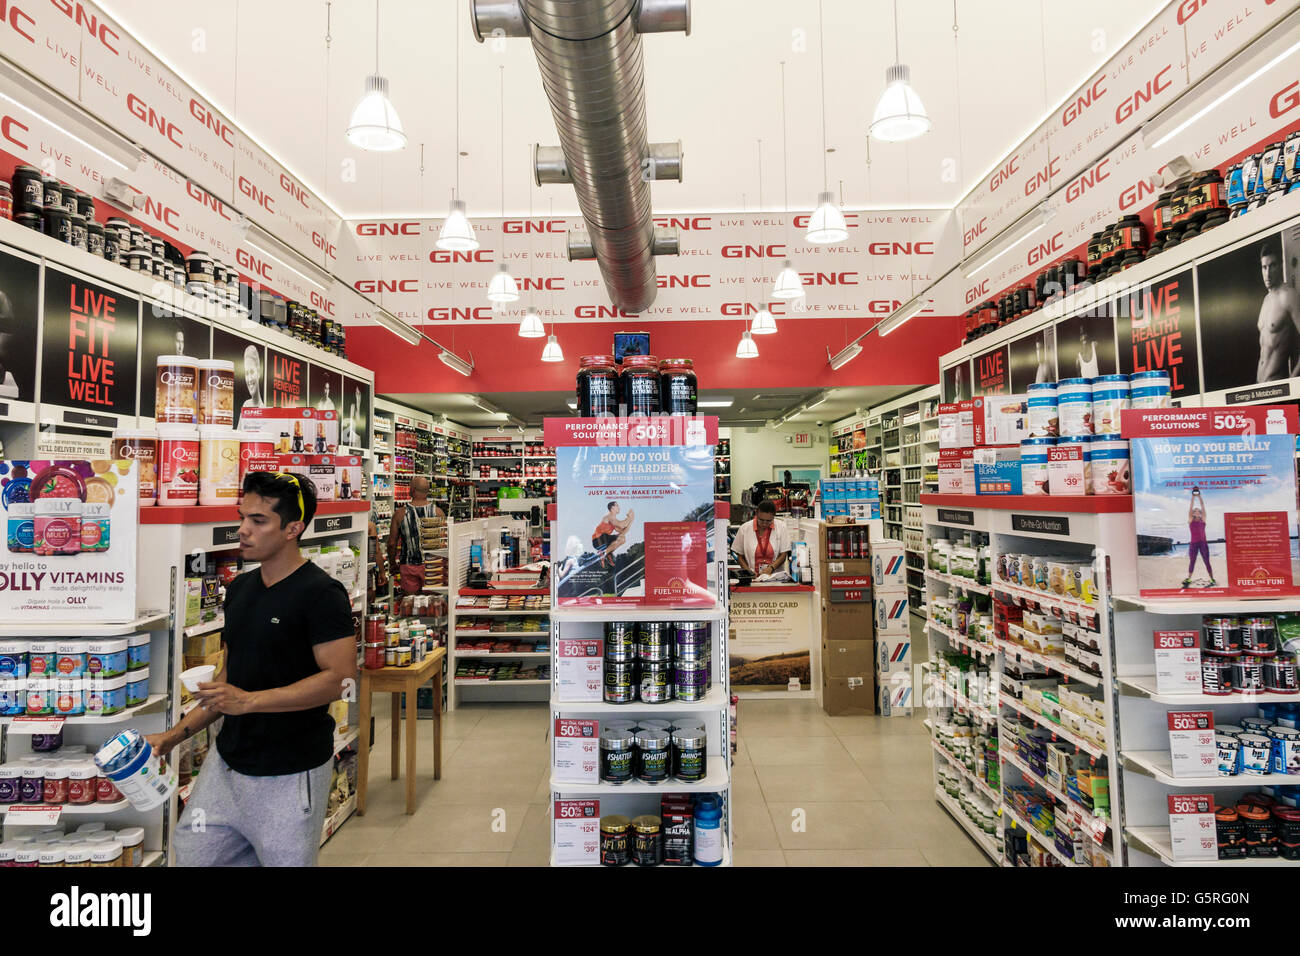 Miami Florida Beach Fußgängerzone Lincoln Road Mall Shopping GNC Vitamine Nahrungsergänzung verkauf Stockbild